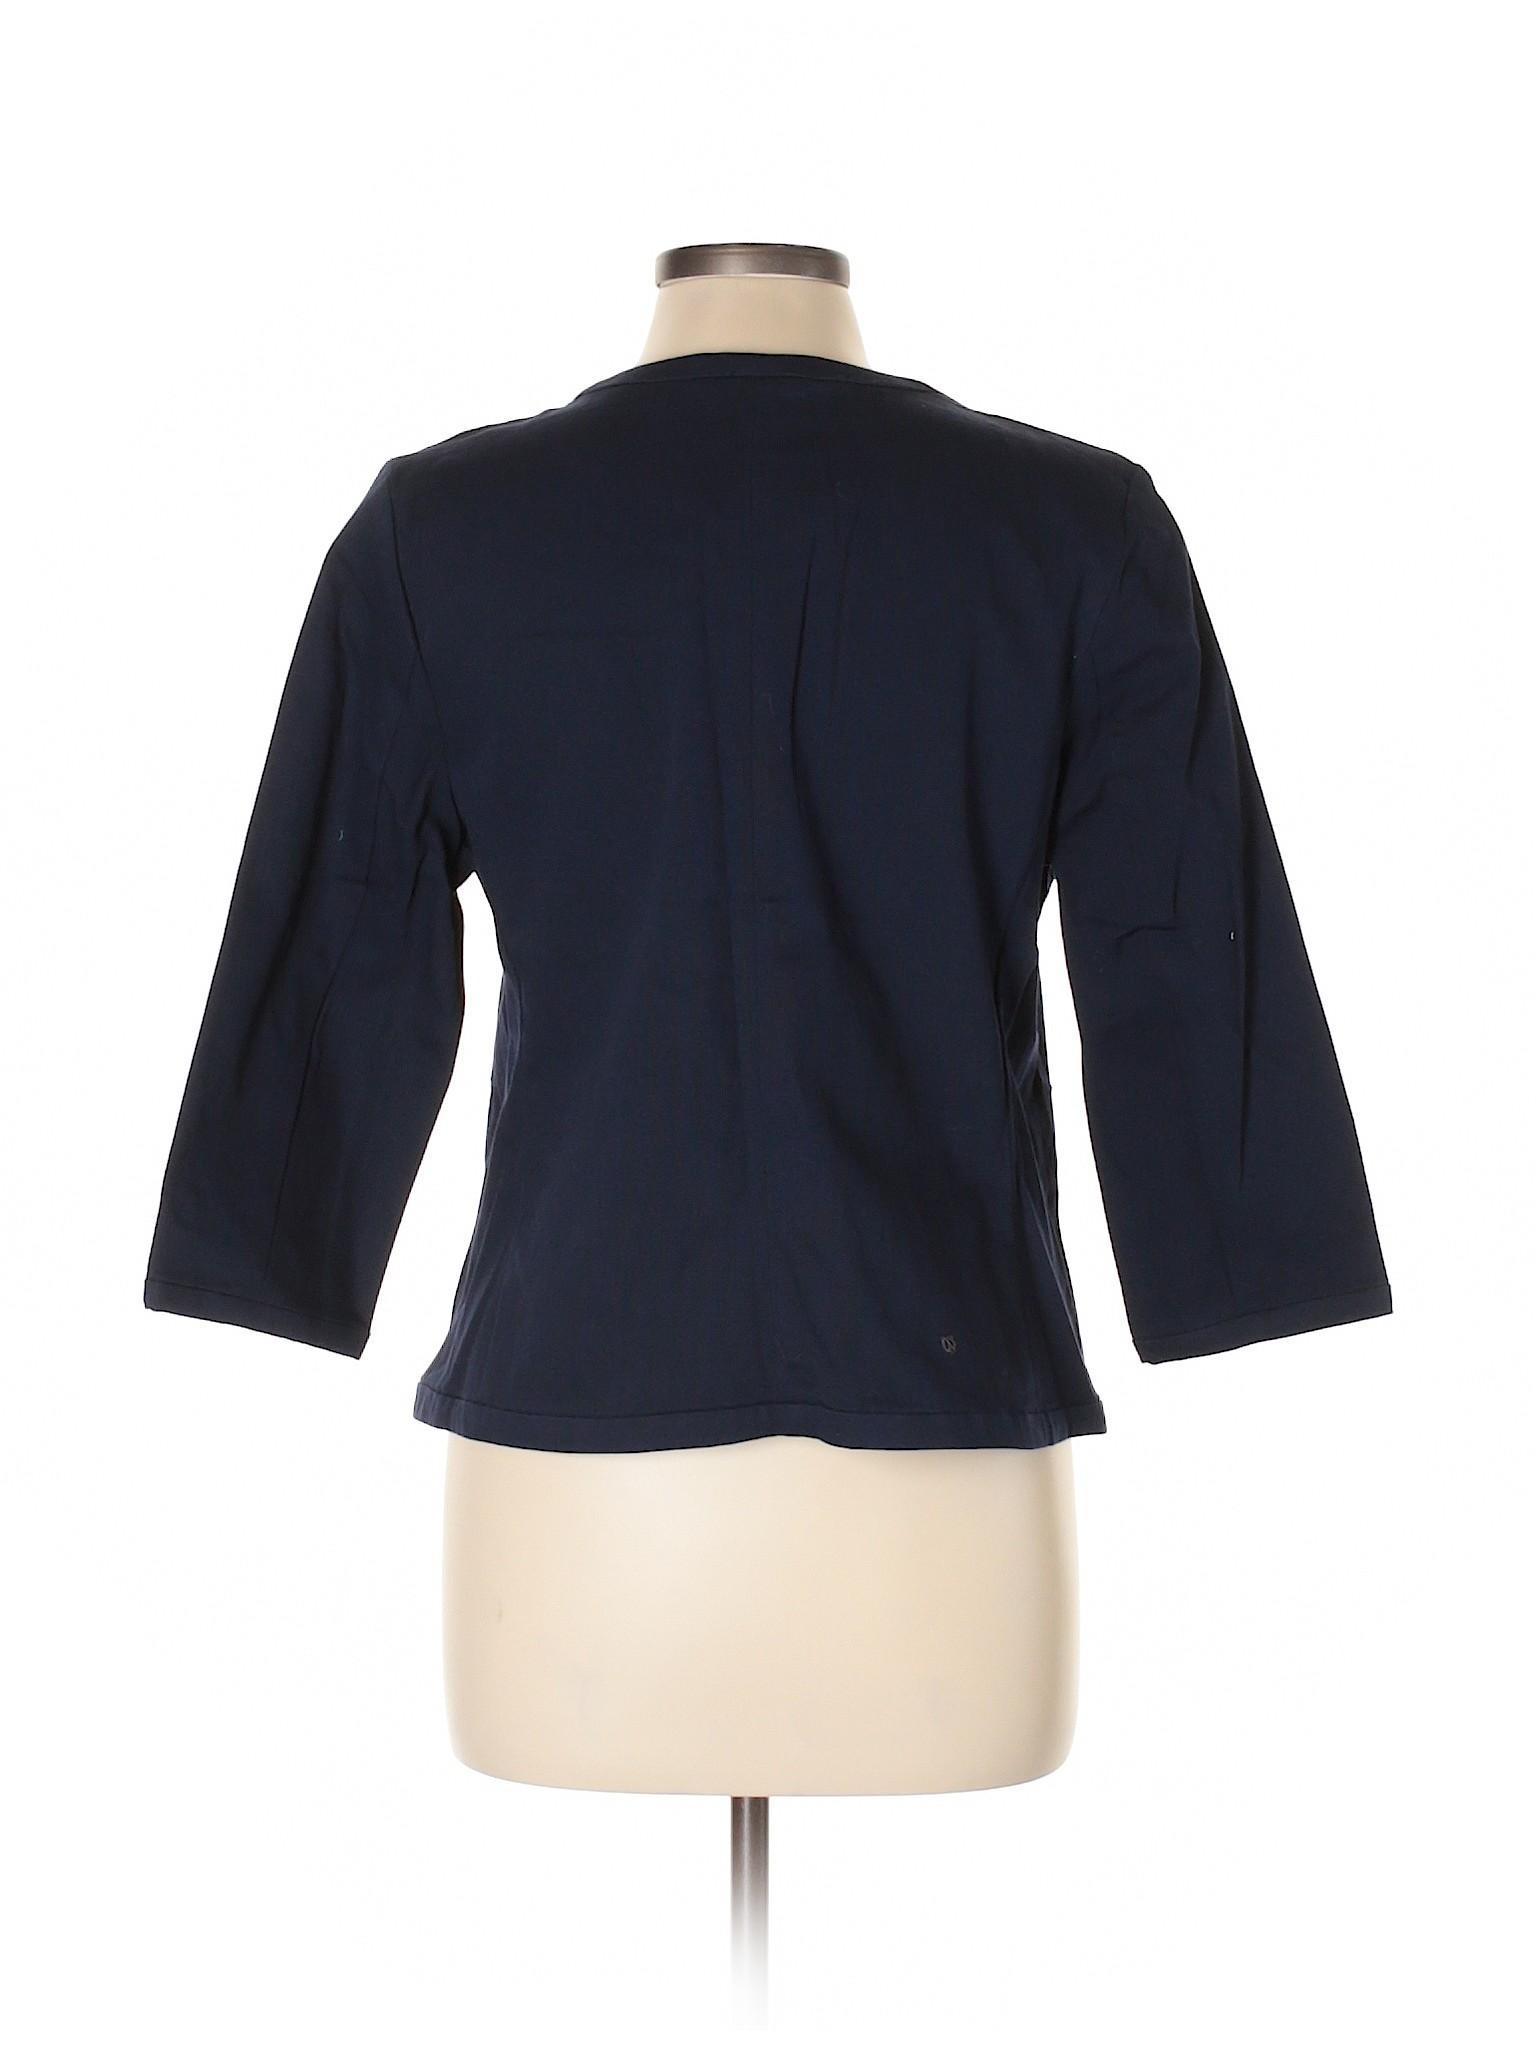 Jacket LIVE Isaac Boutique Mizrahi leisure HqIRSR